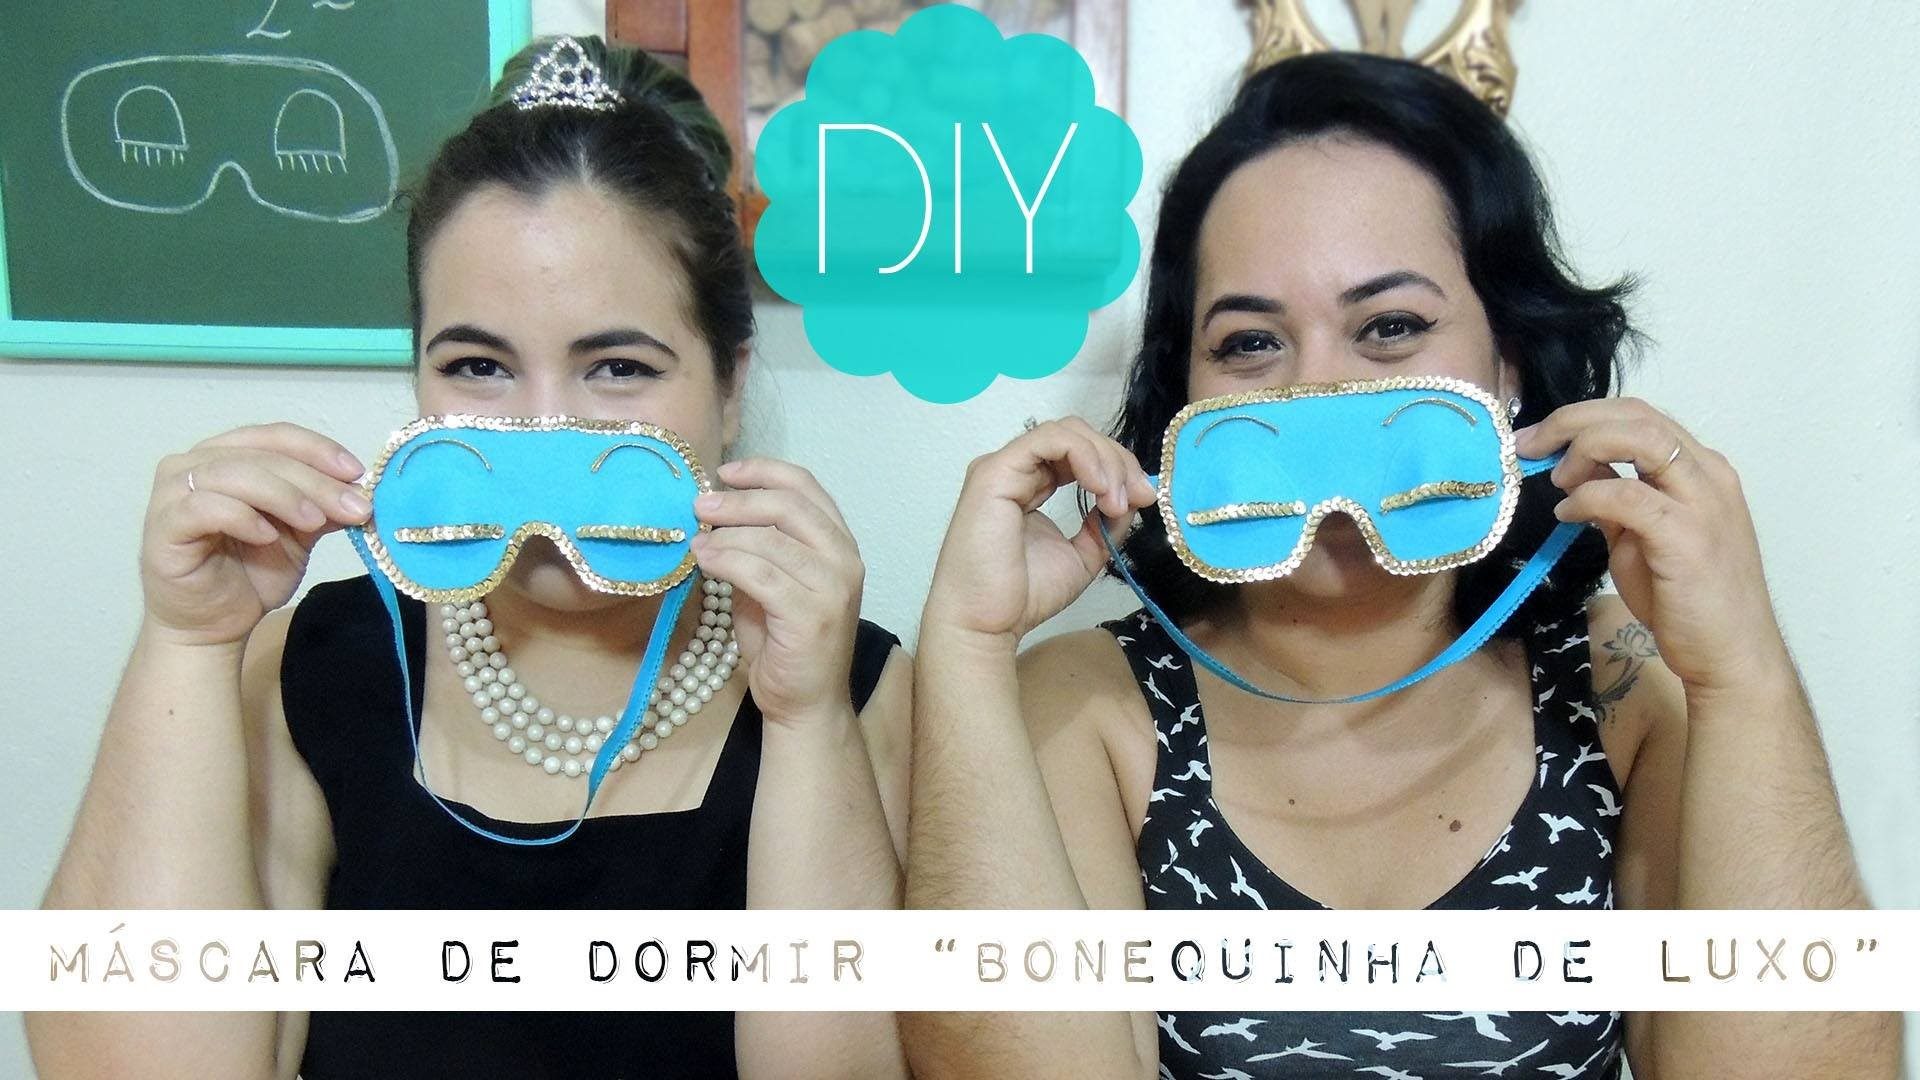 DIY - Máscara de dormir 'Bonequinha de Luxo'